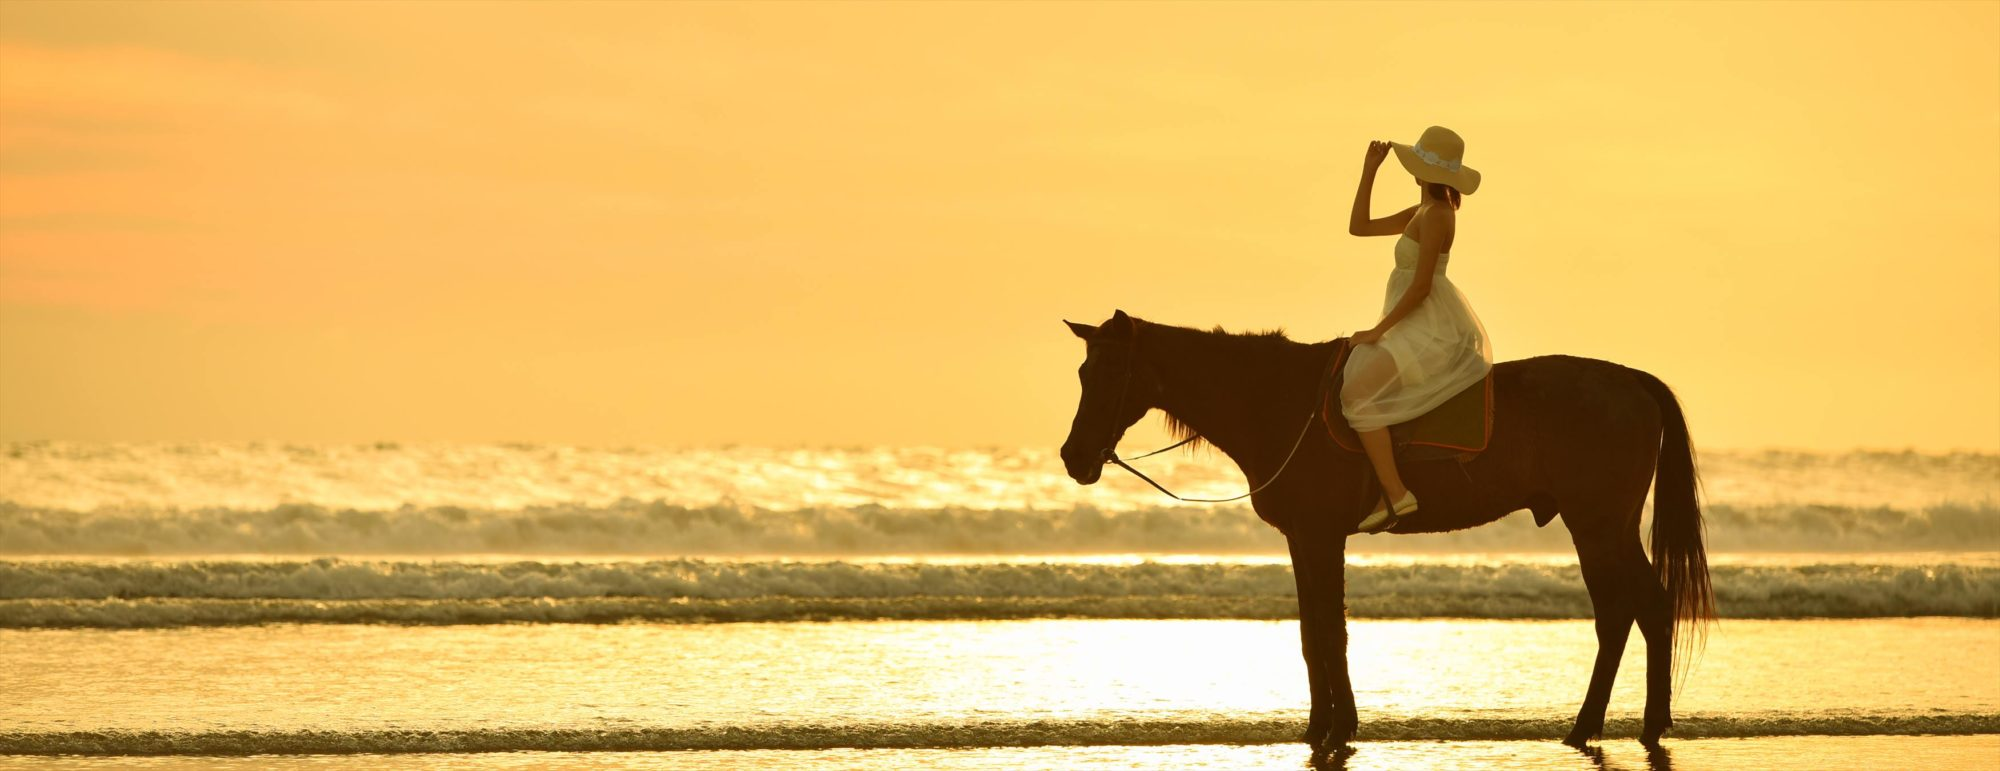 Seminyak Beach Horse Riding<br /> スミニャック・ビーチ・ホース・ライディング